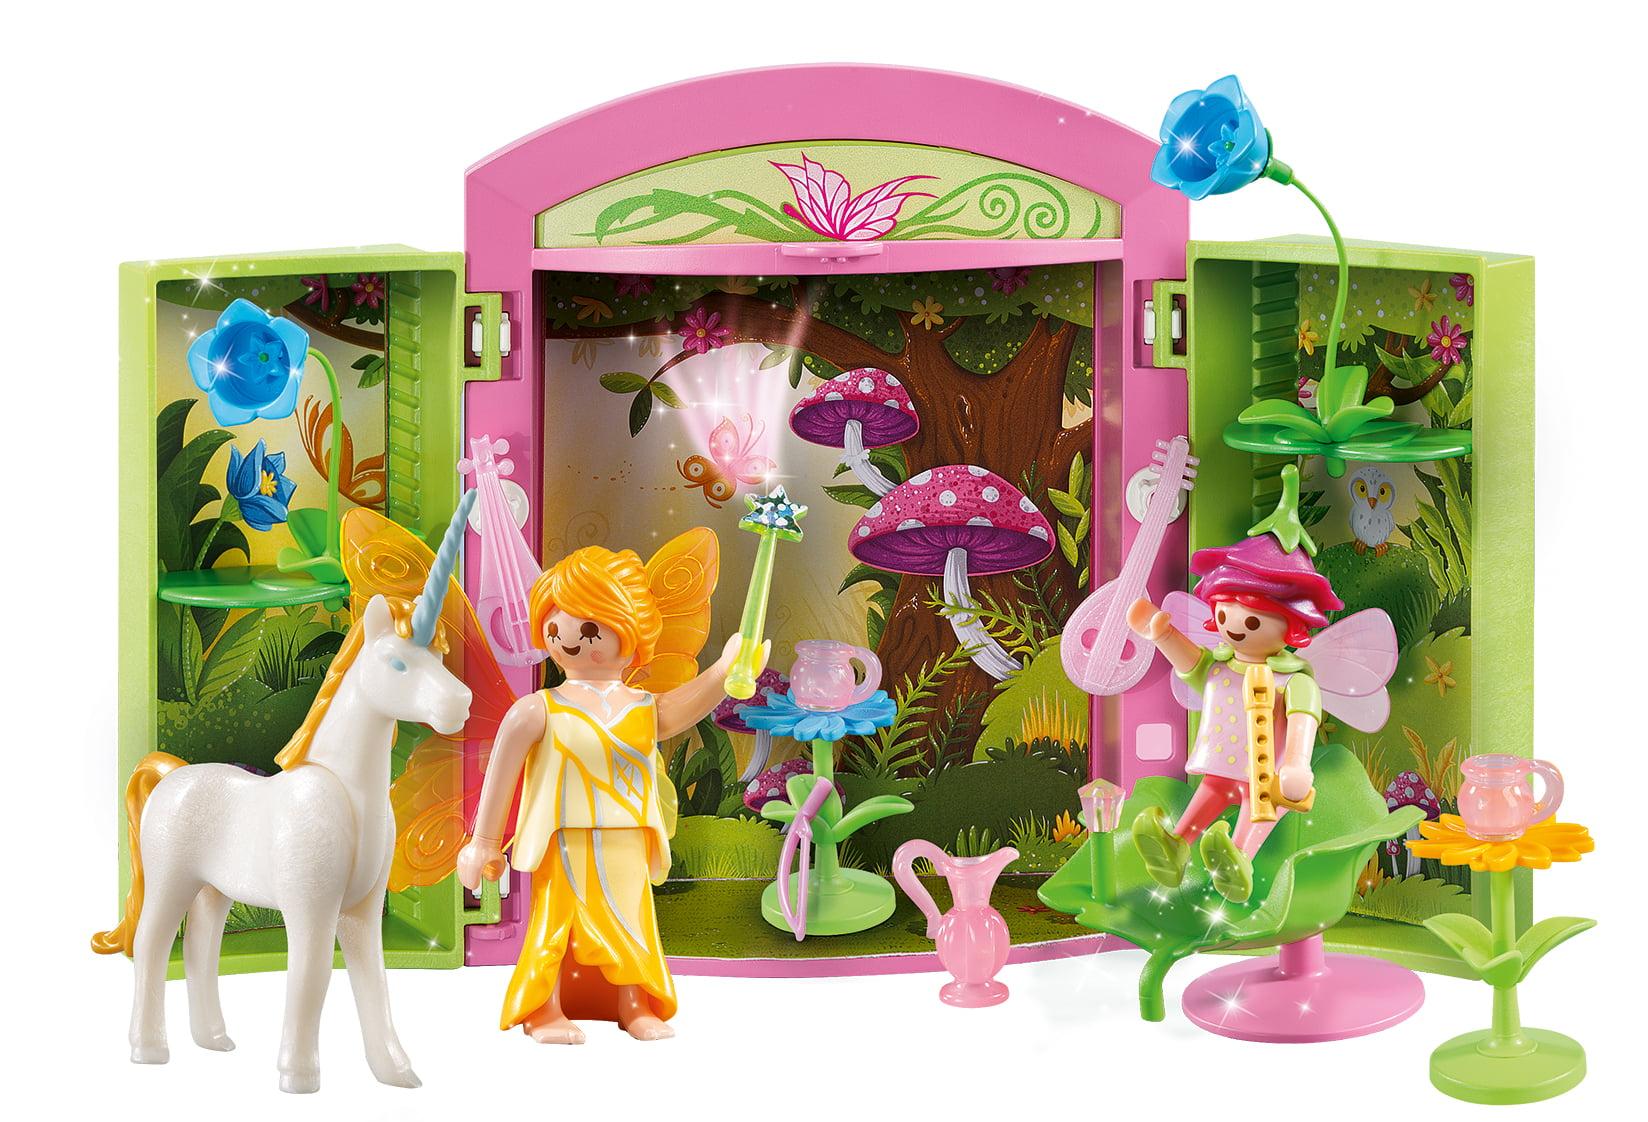 PLAYMOBIL Fairy Garden Play Box by Playmobil